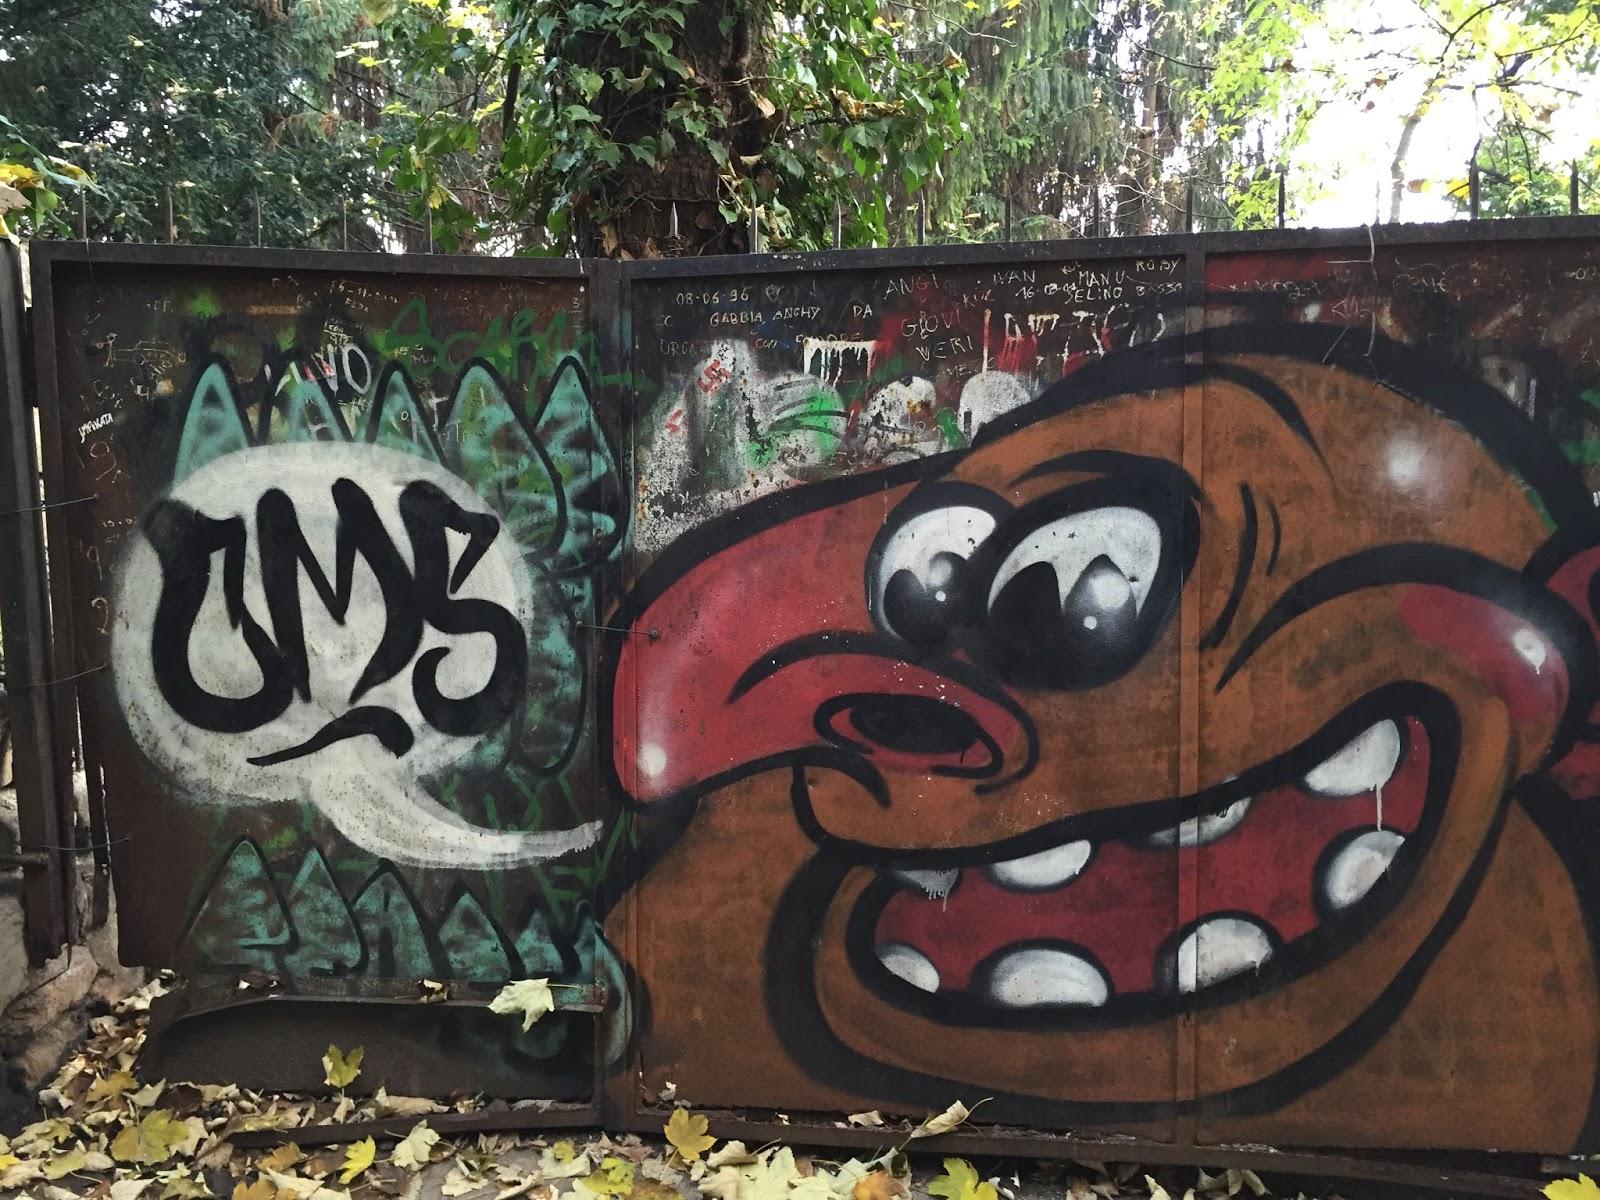 travelmarx bergamo street art faces on walls fish pirate friendly monster